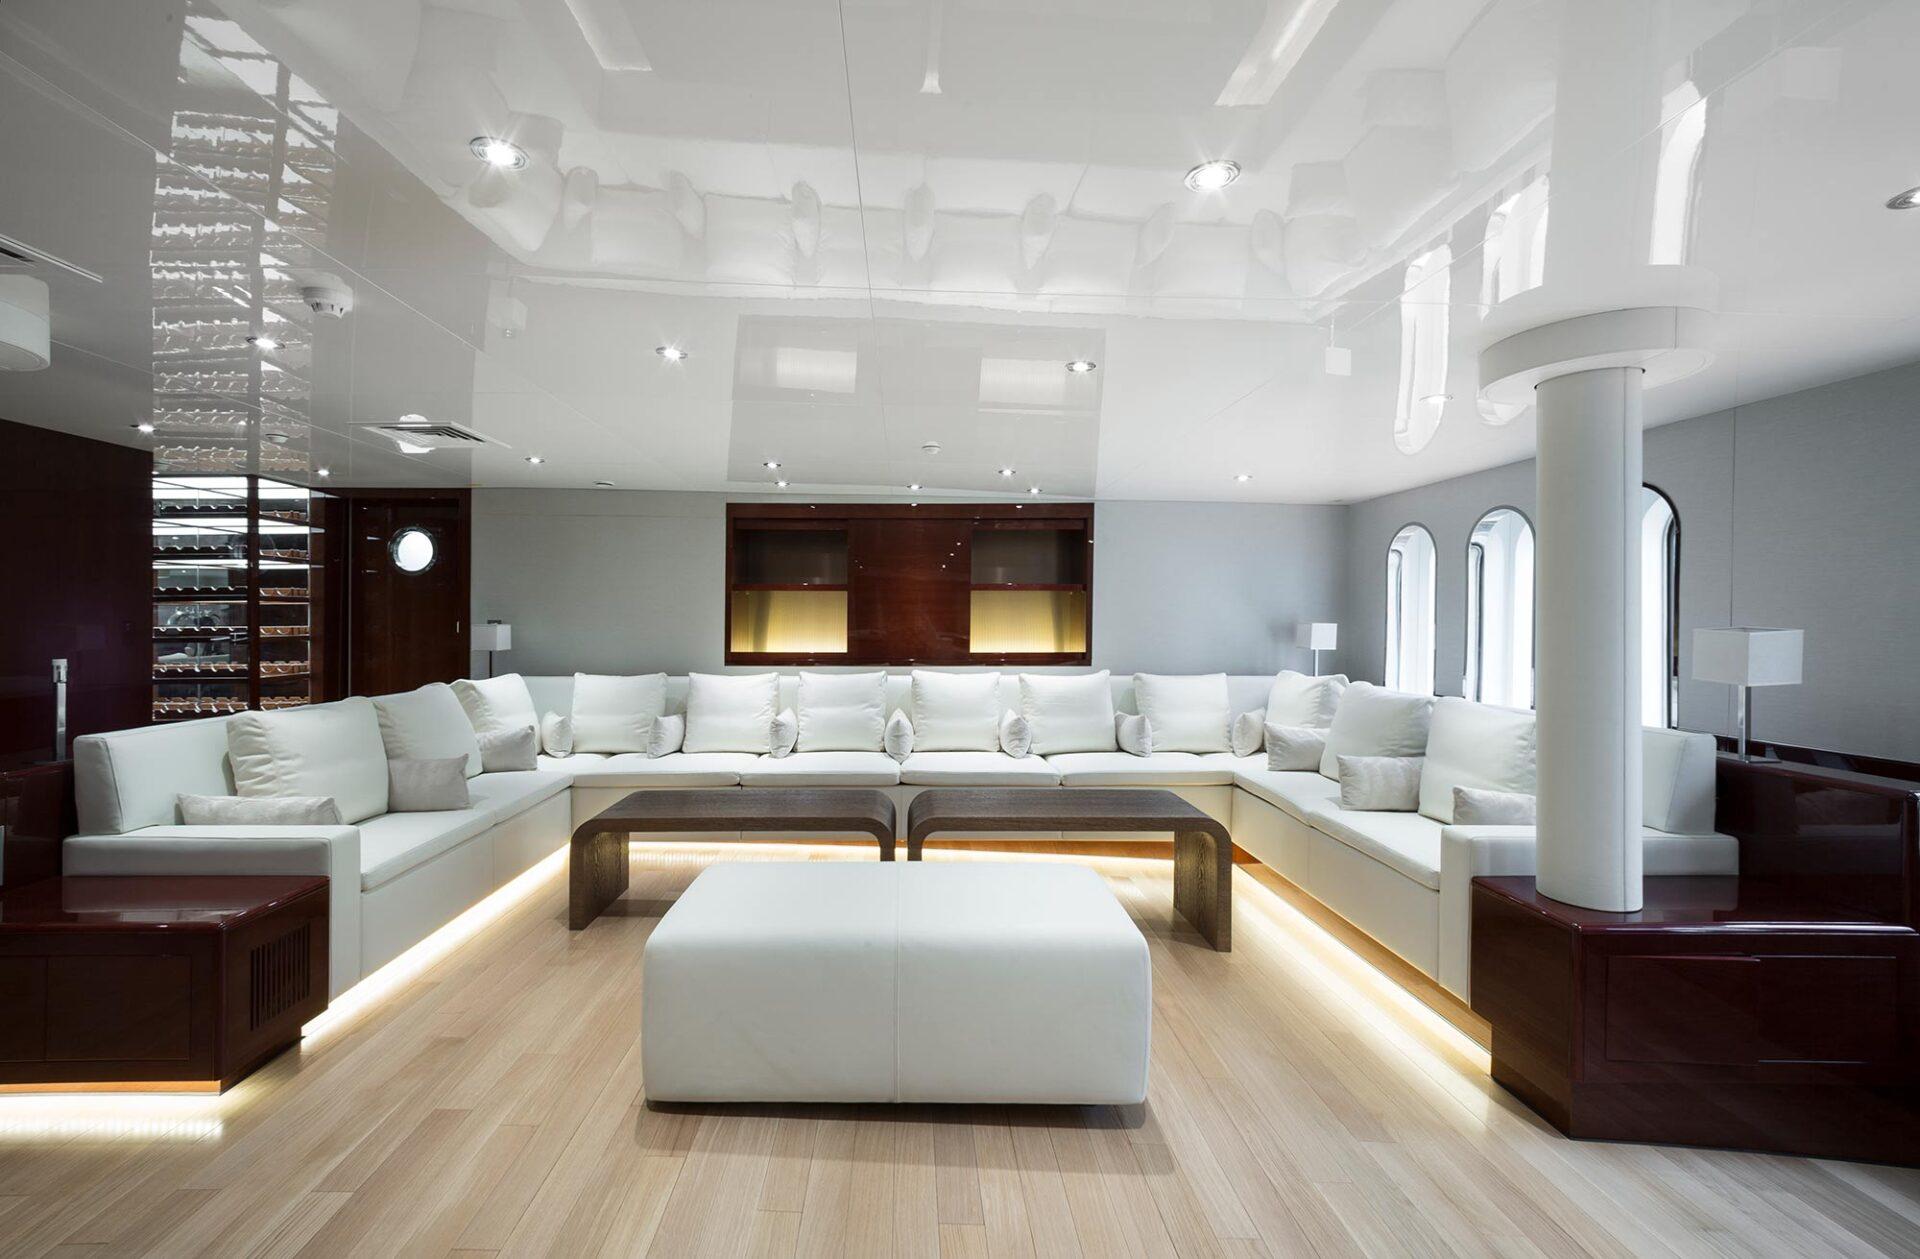 Enigma interior design yacht